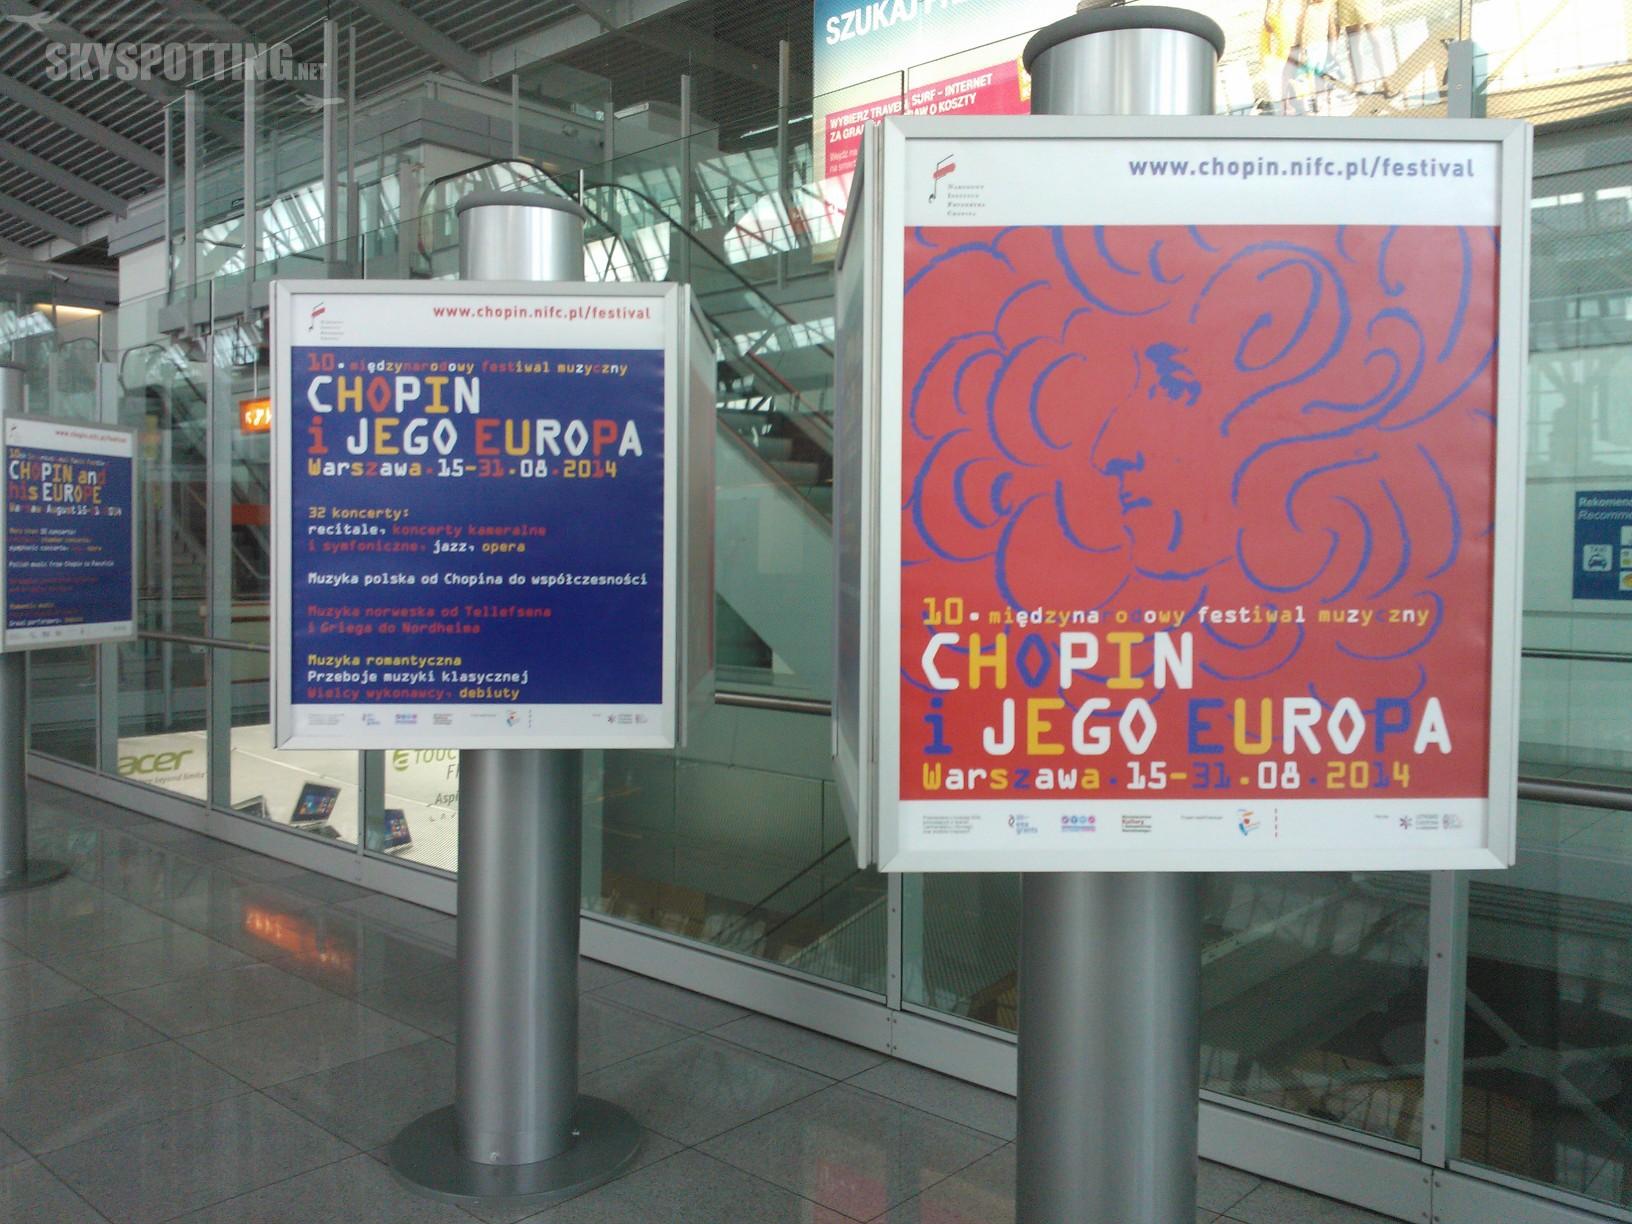 "Lotnisko Chopina partnerem festiwalu ""Chopin i jego Europa"""